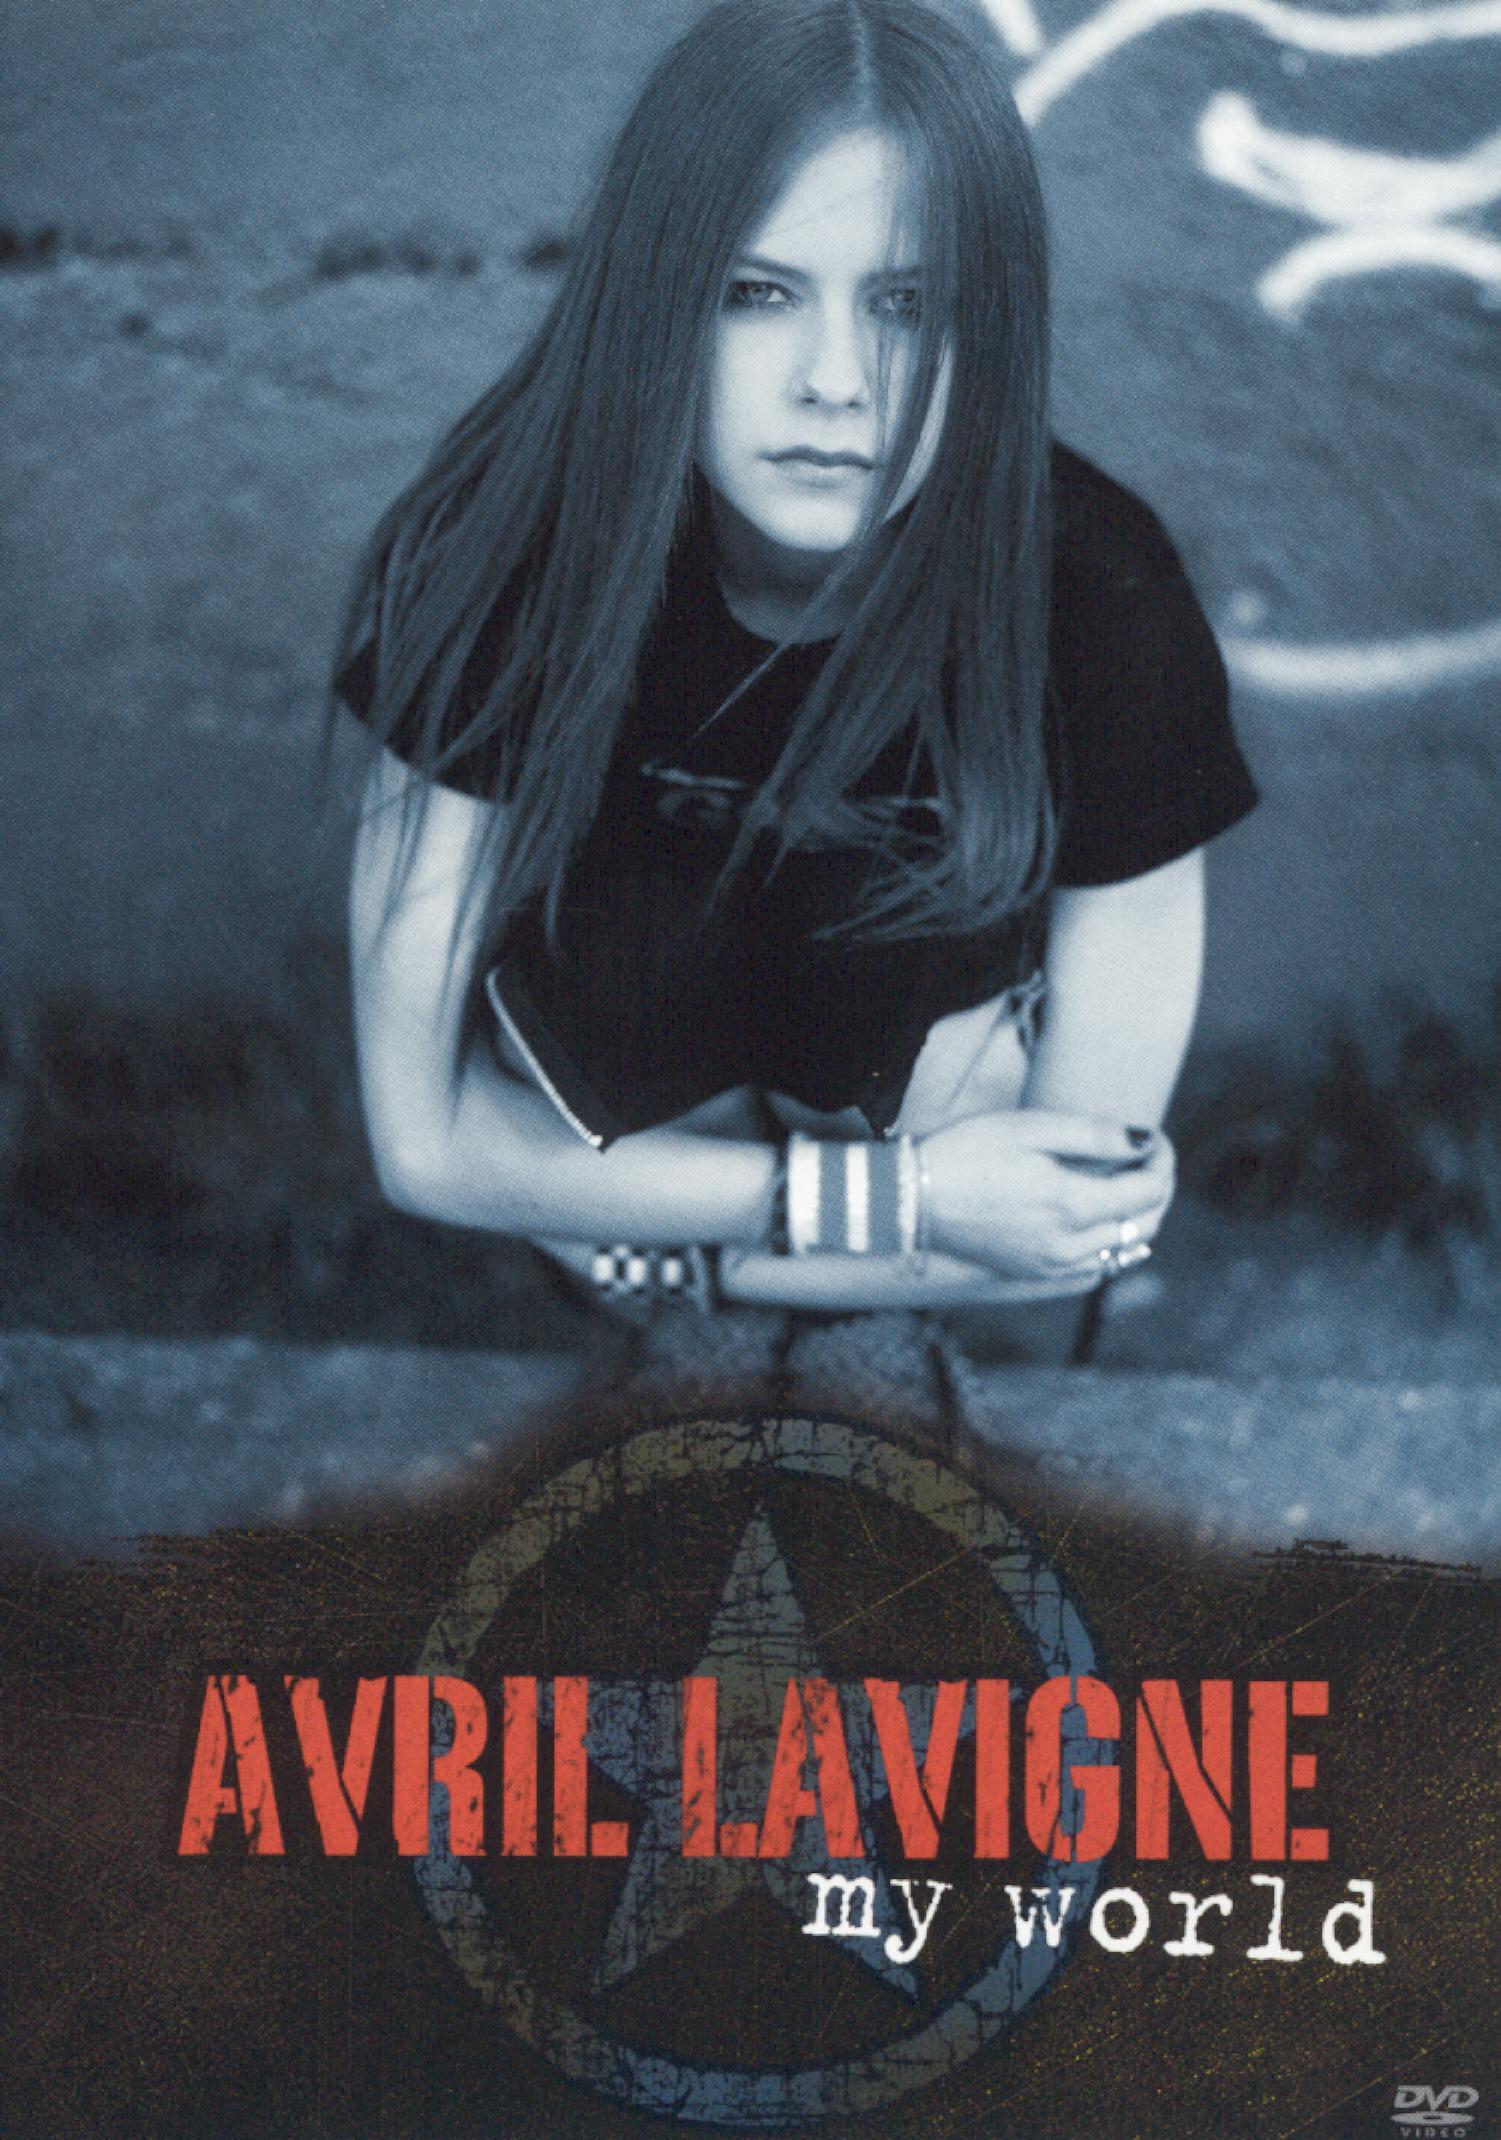 Avril Lavigne: My World